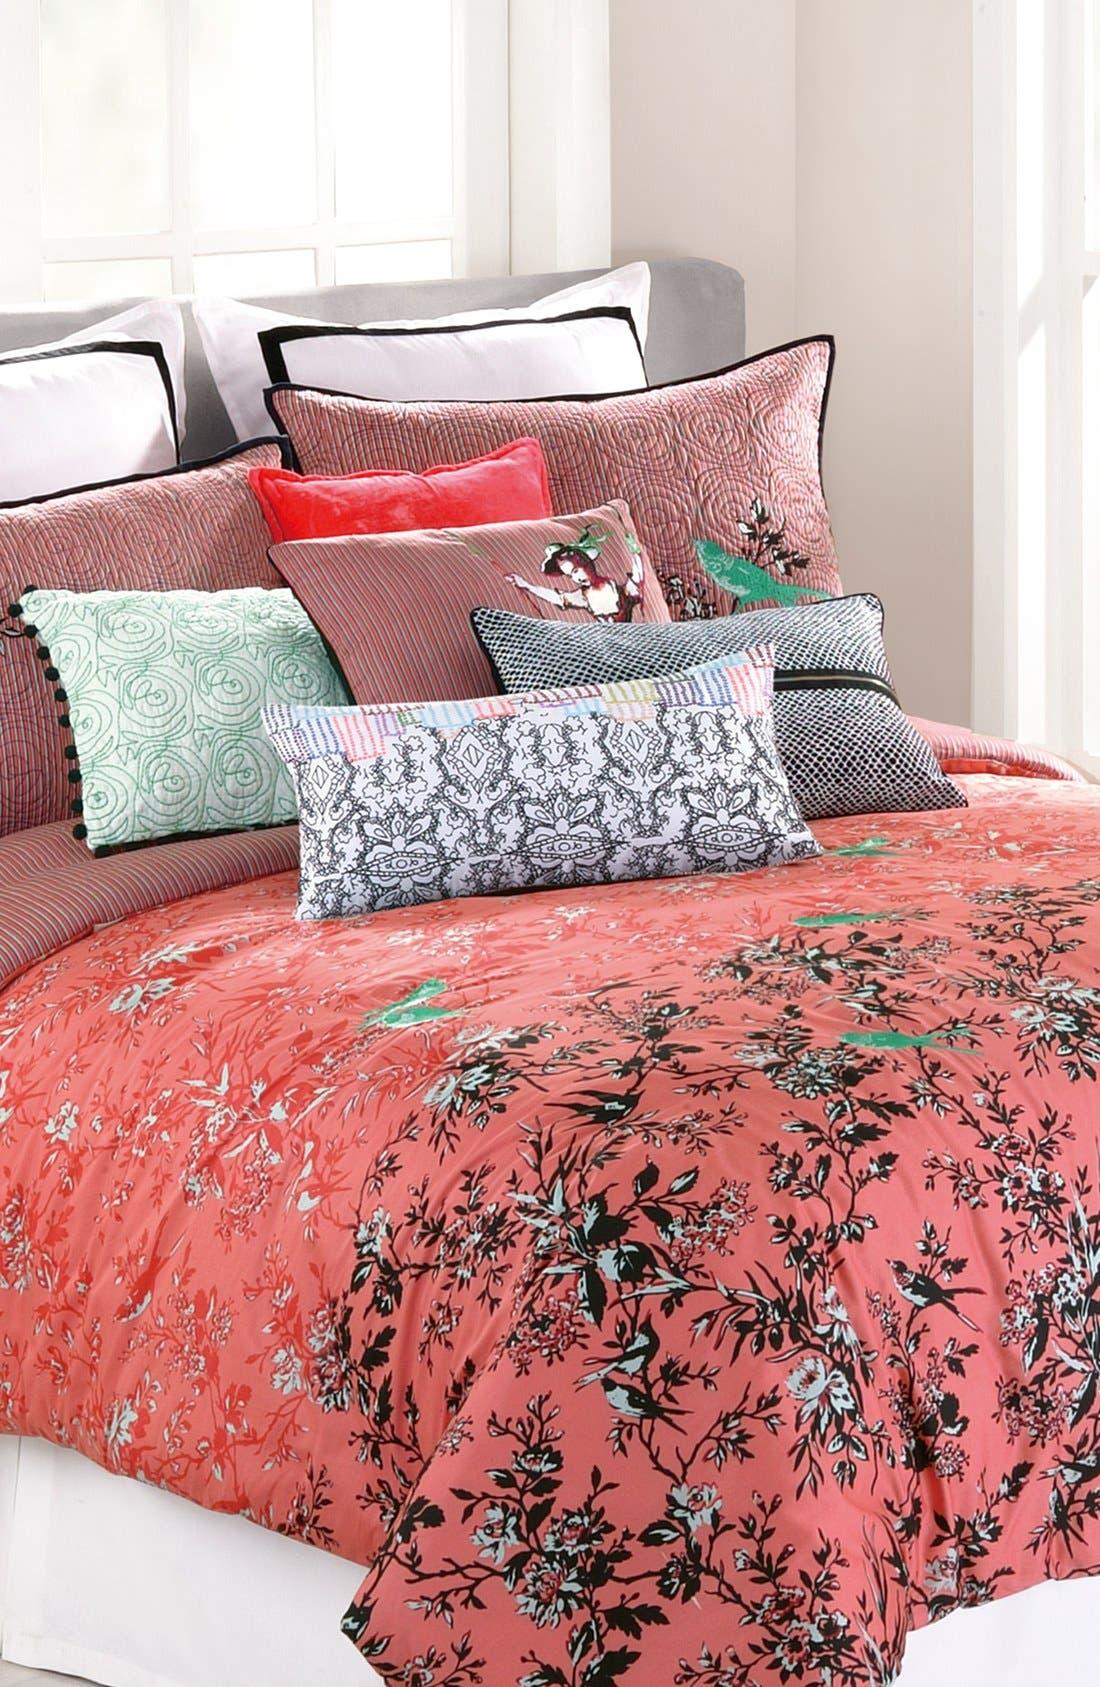 Alternate Image 1 Selected - Nanette Lepore Villa 'Botanical Porcelain' Print Cotton Comforter Set